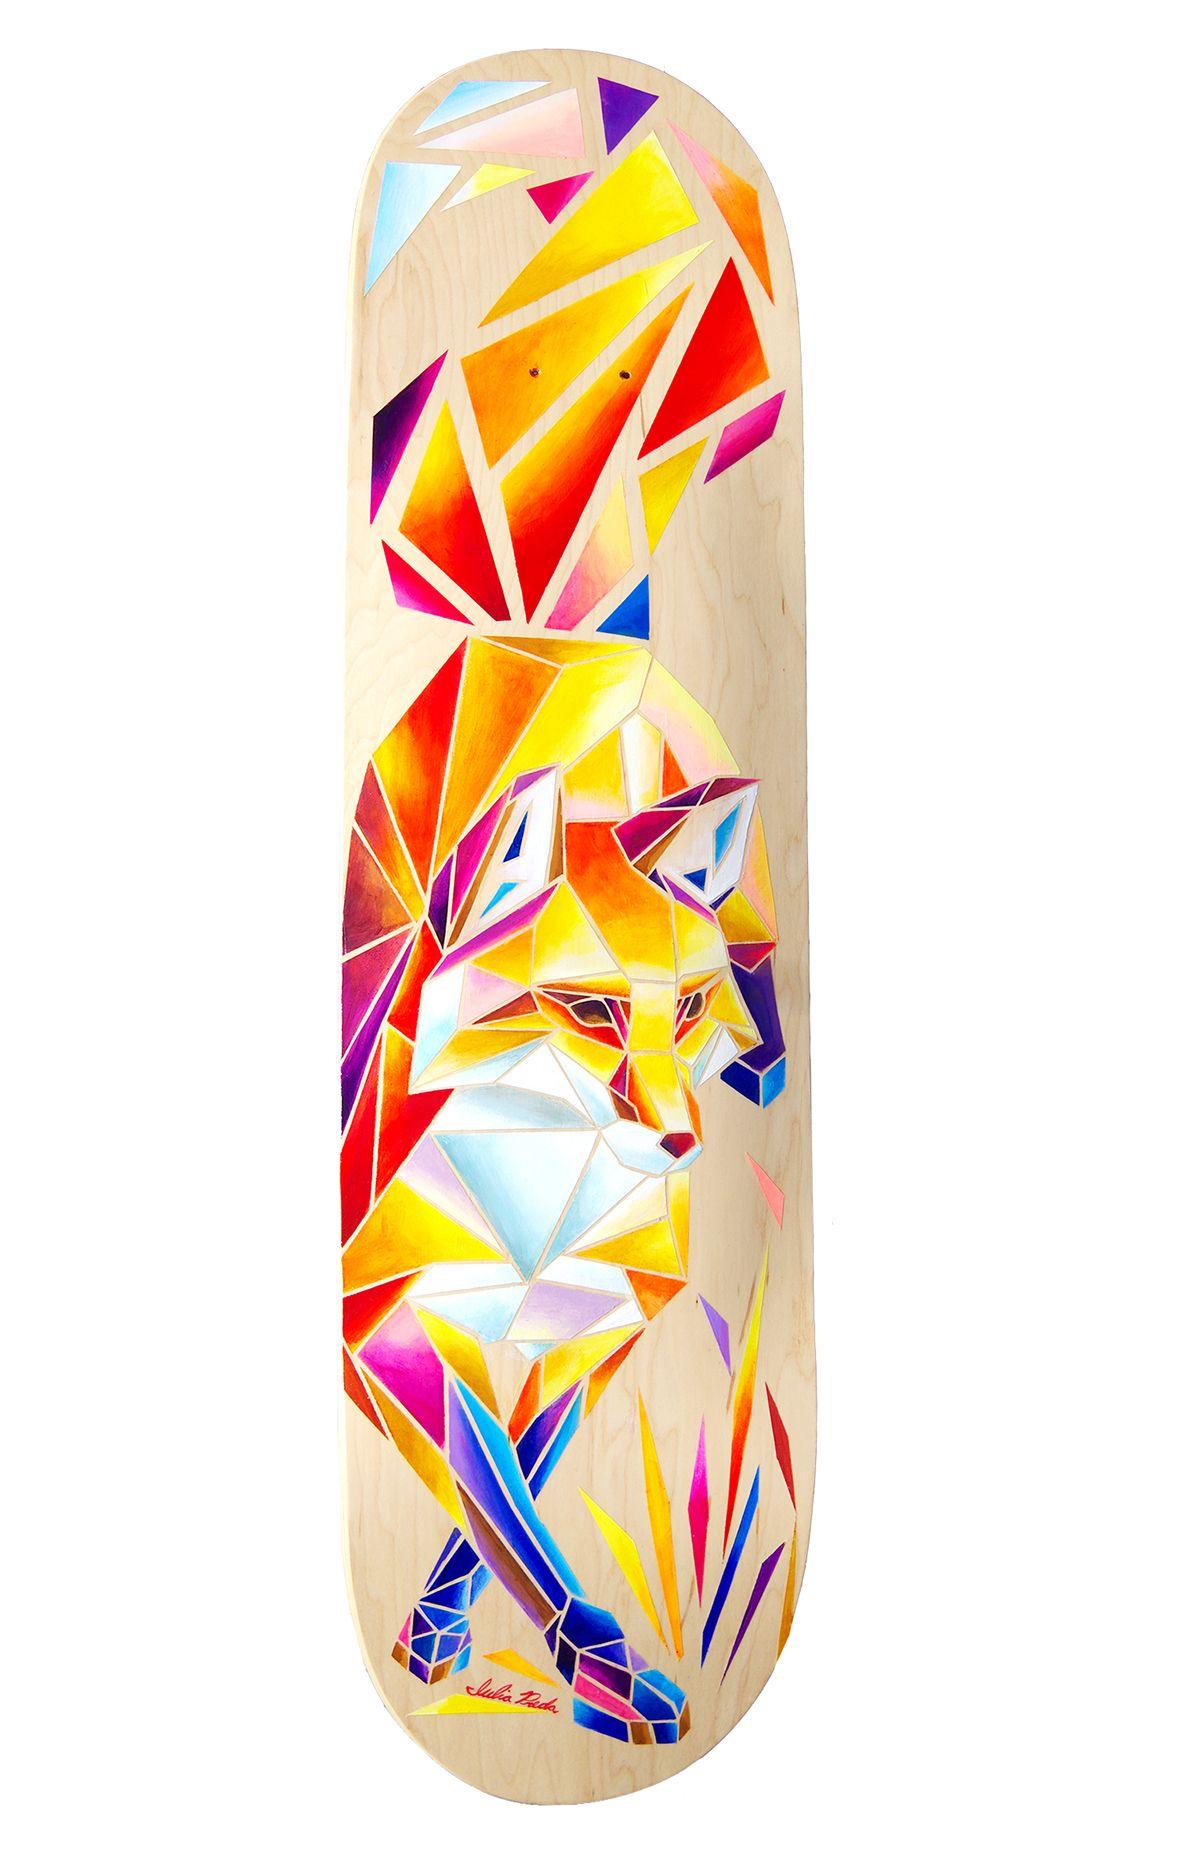 Red Fox Skateboard On Behance Skateboard Deck Art Skateboard Art Design Cool Skateboards